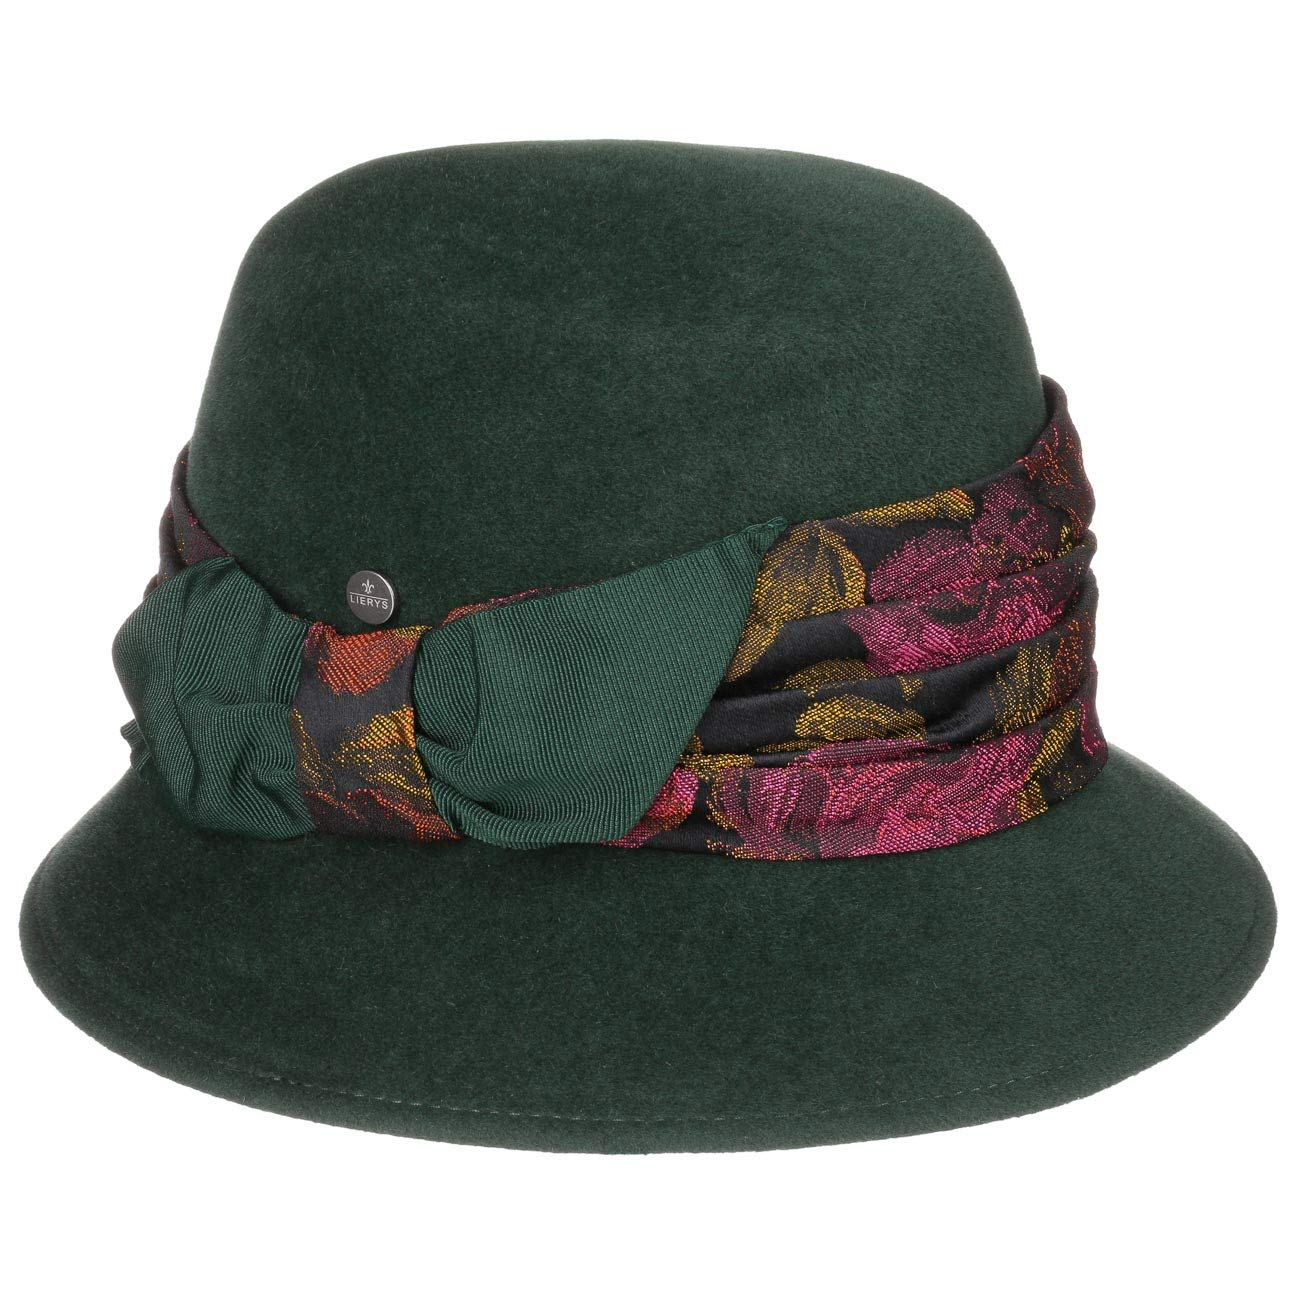 Made in Italy Herbst-Winter Lierys Haarfilzhut mit Brokatgarnitur Damenhut Filzhut Damenglocke Filzglocke Winterhut Damen